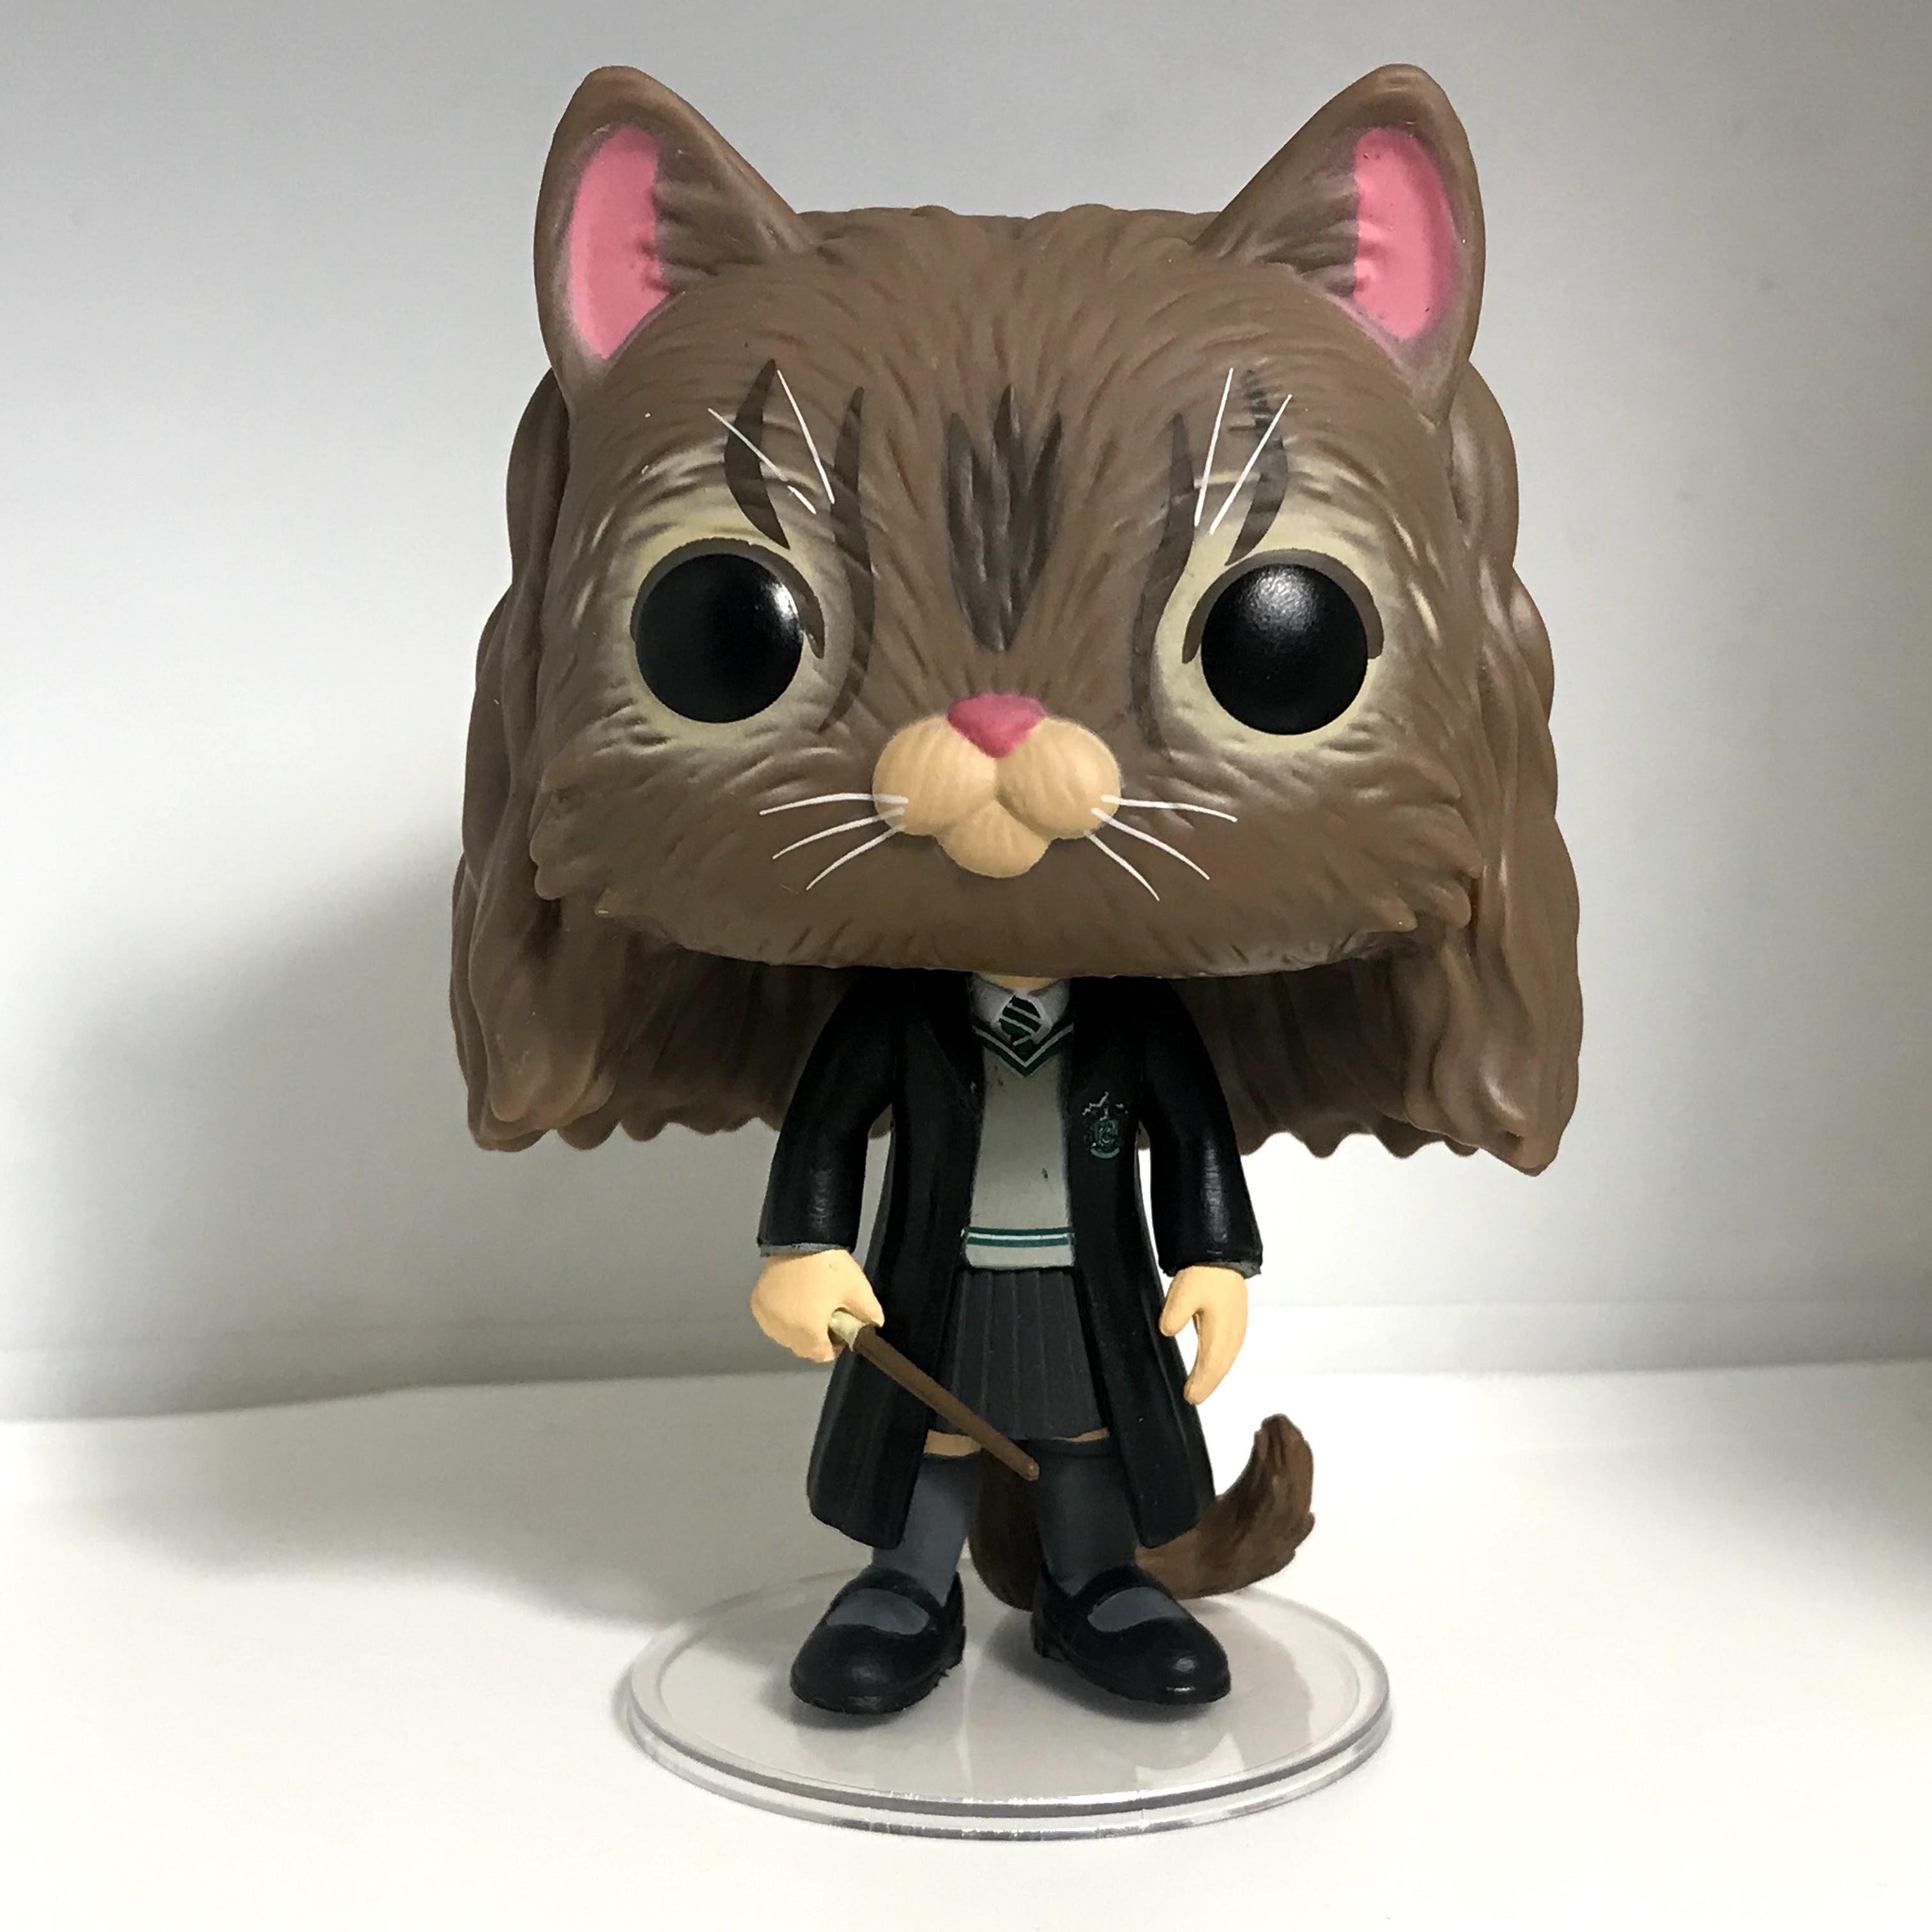 77 Hermione Granger as a Cat